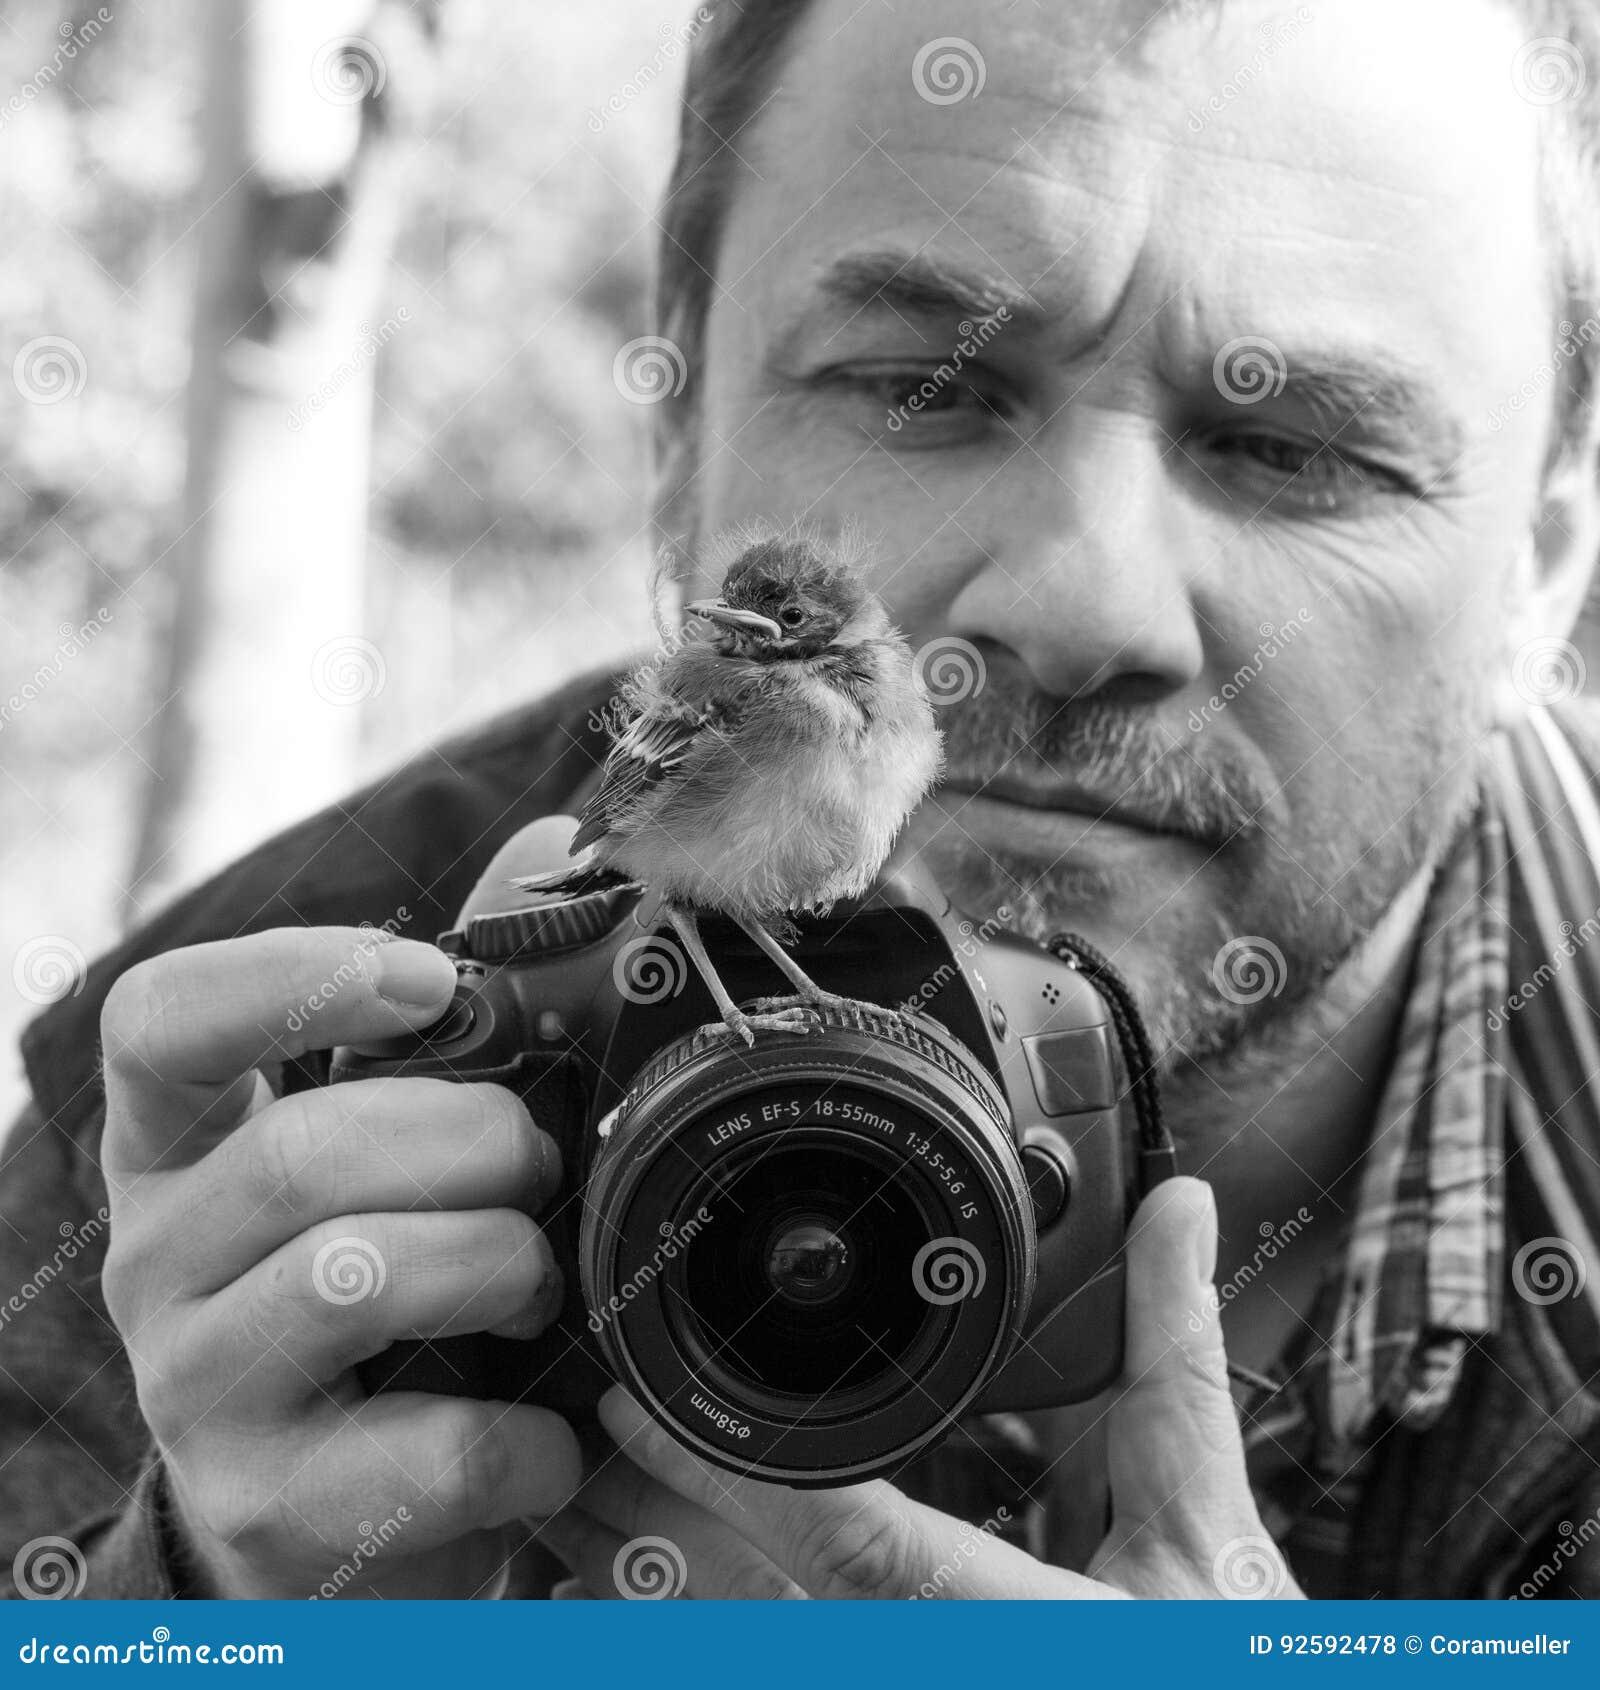 Download Bird and photographer stock photo. Image of cute, bird - 92592478